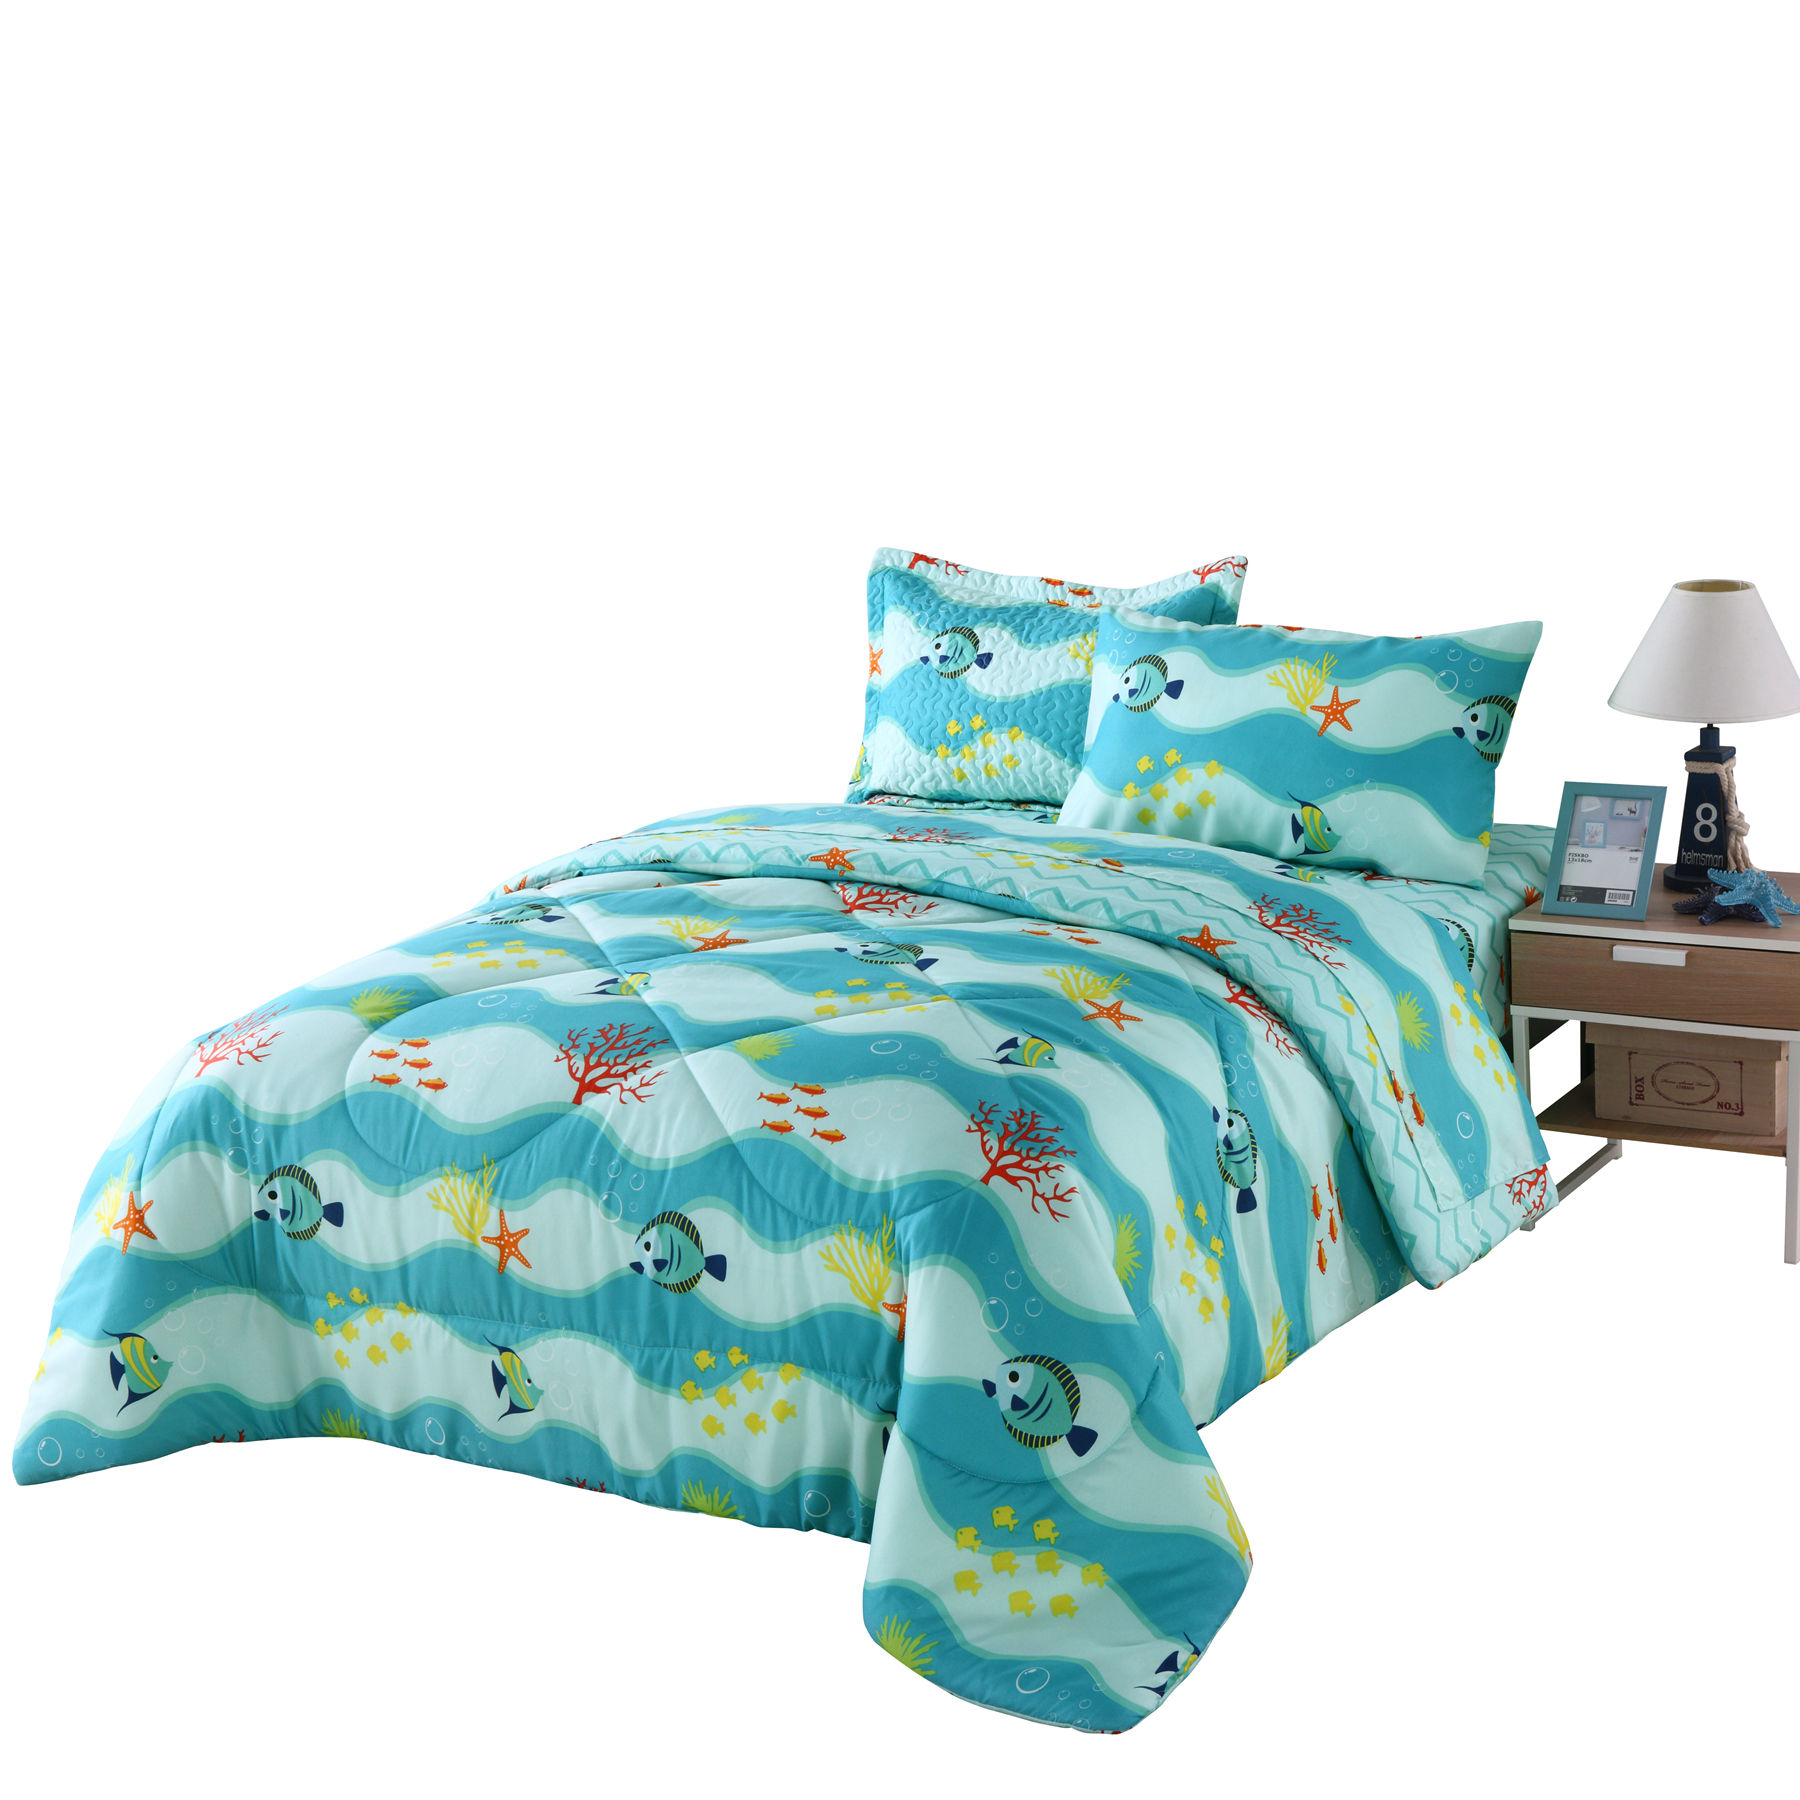 Marcielo Kids Comforter Set Girls Comforter Set Kids Bedding Set Include Sheet Set Bunk Beds For Kids Twin Full 277fish Comforter Twin Walmart Com Walmart Com